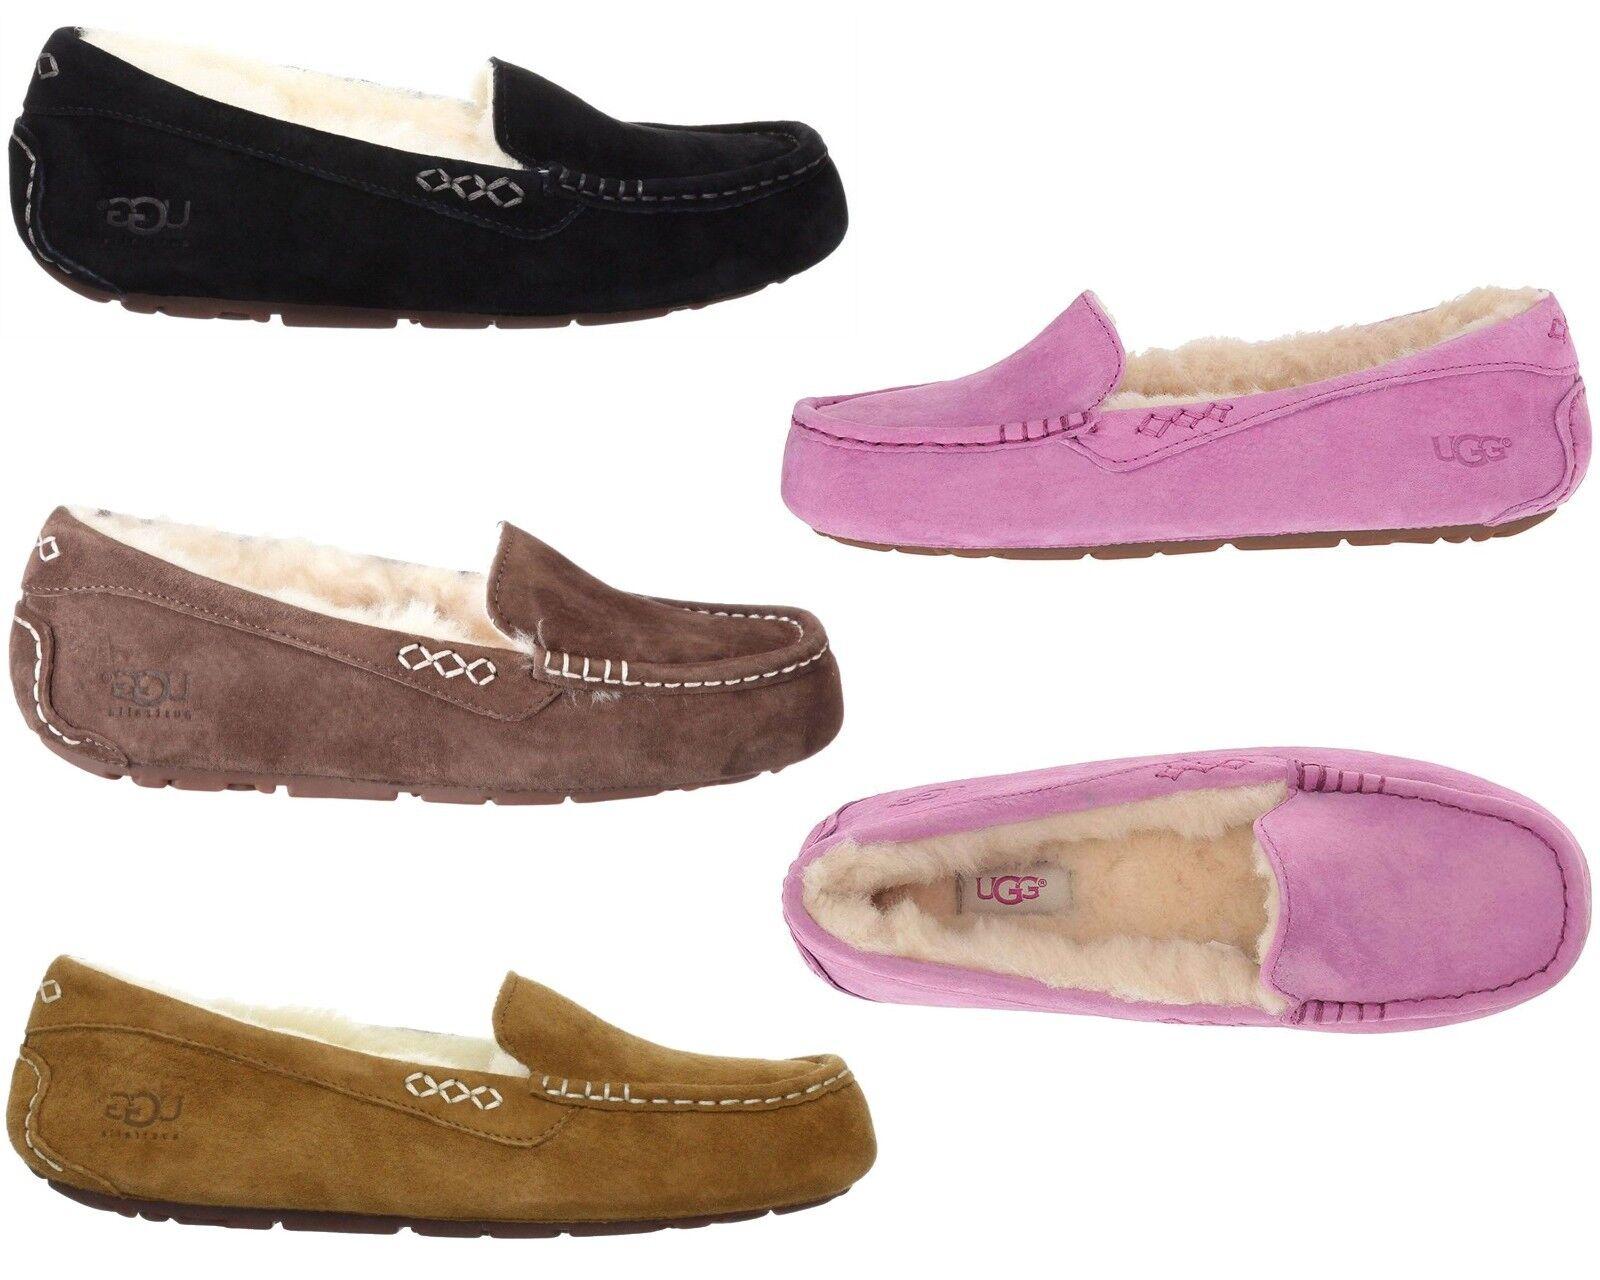 UGG Australia Women NEW Ansley Slipper Shoes Slip On Comfort Home Moccasins